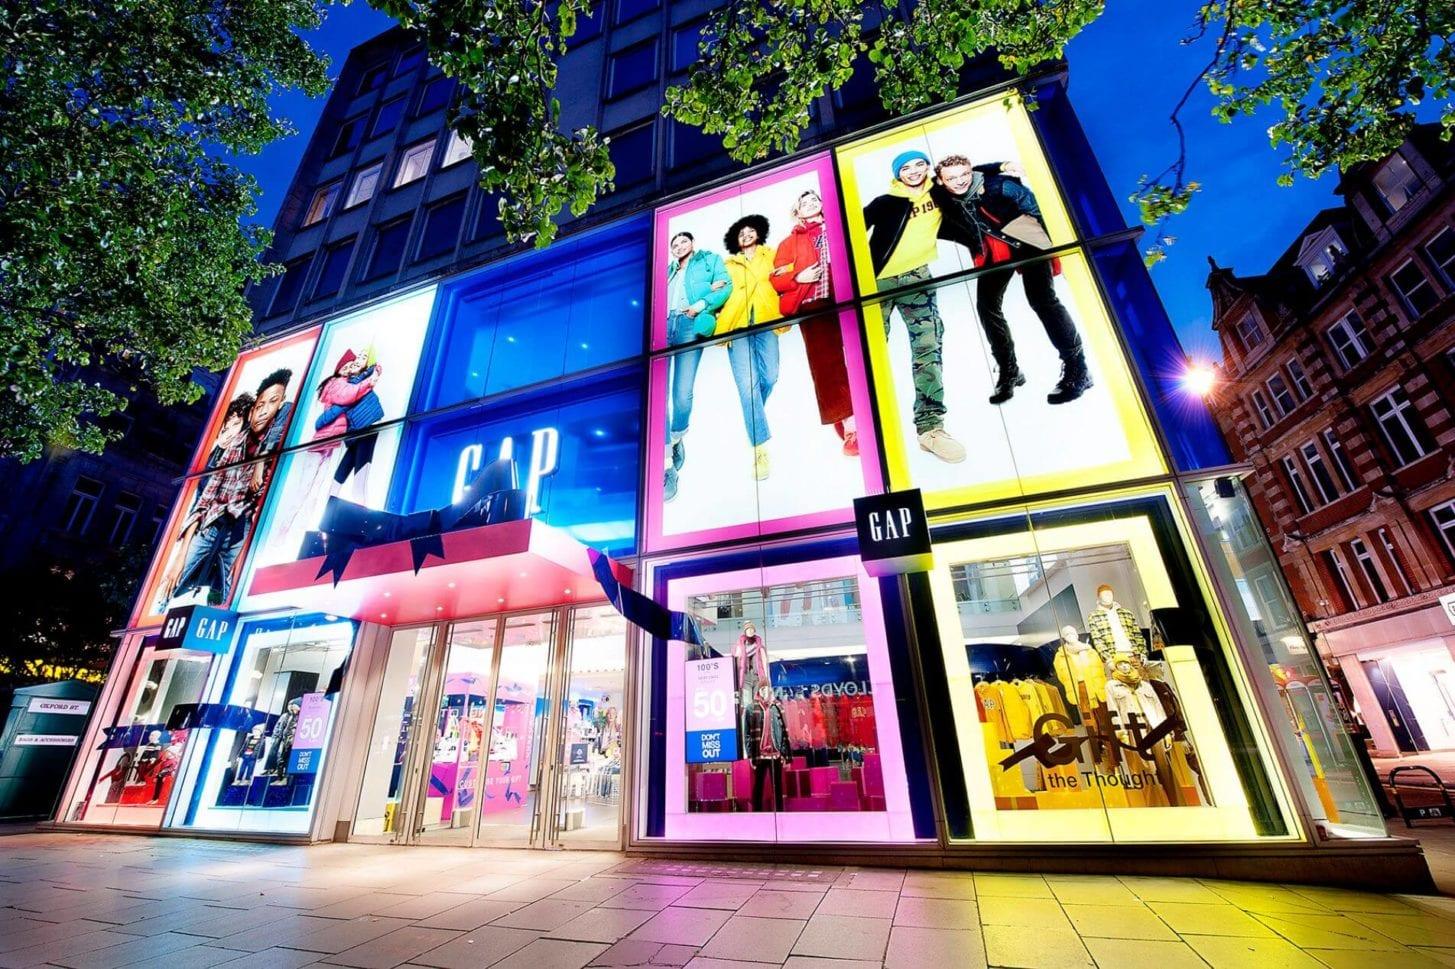 gap london retail window display